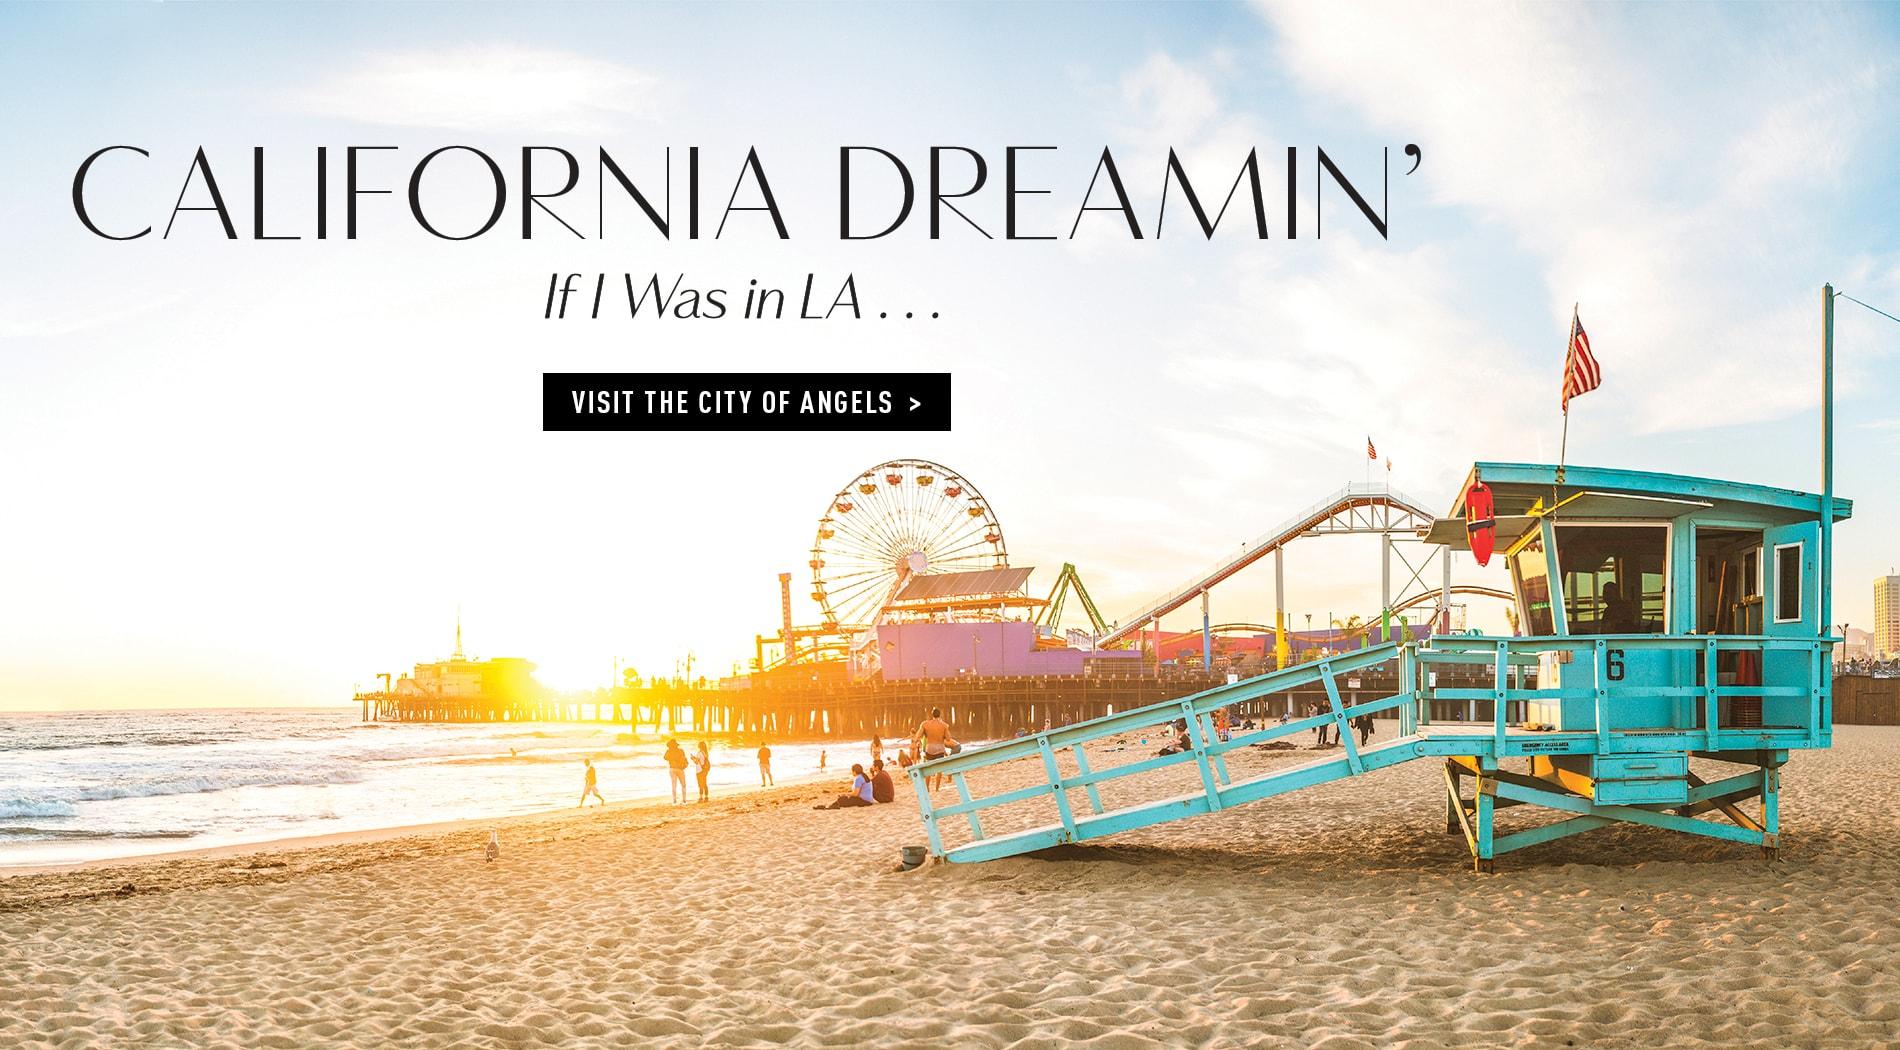 Los Angeles, Los Angeles California, Los Angeles Travel Guide, LA Travel Guide, Santa Monica, Santa Monic Pier